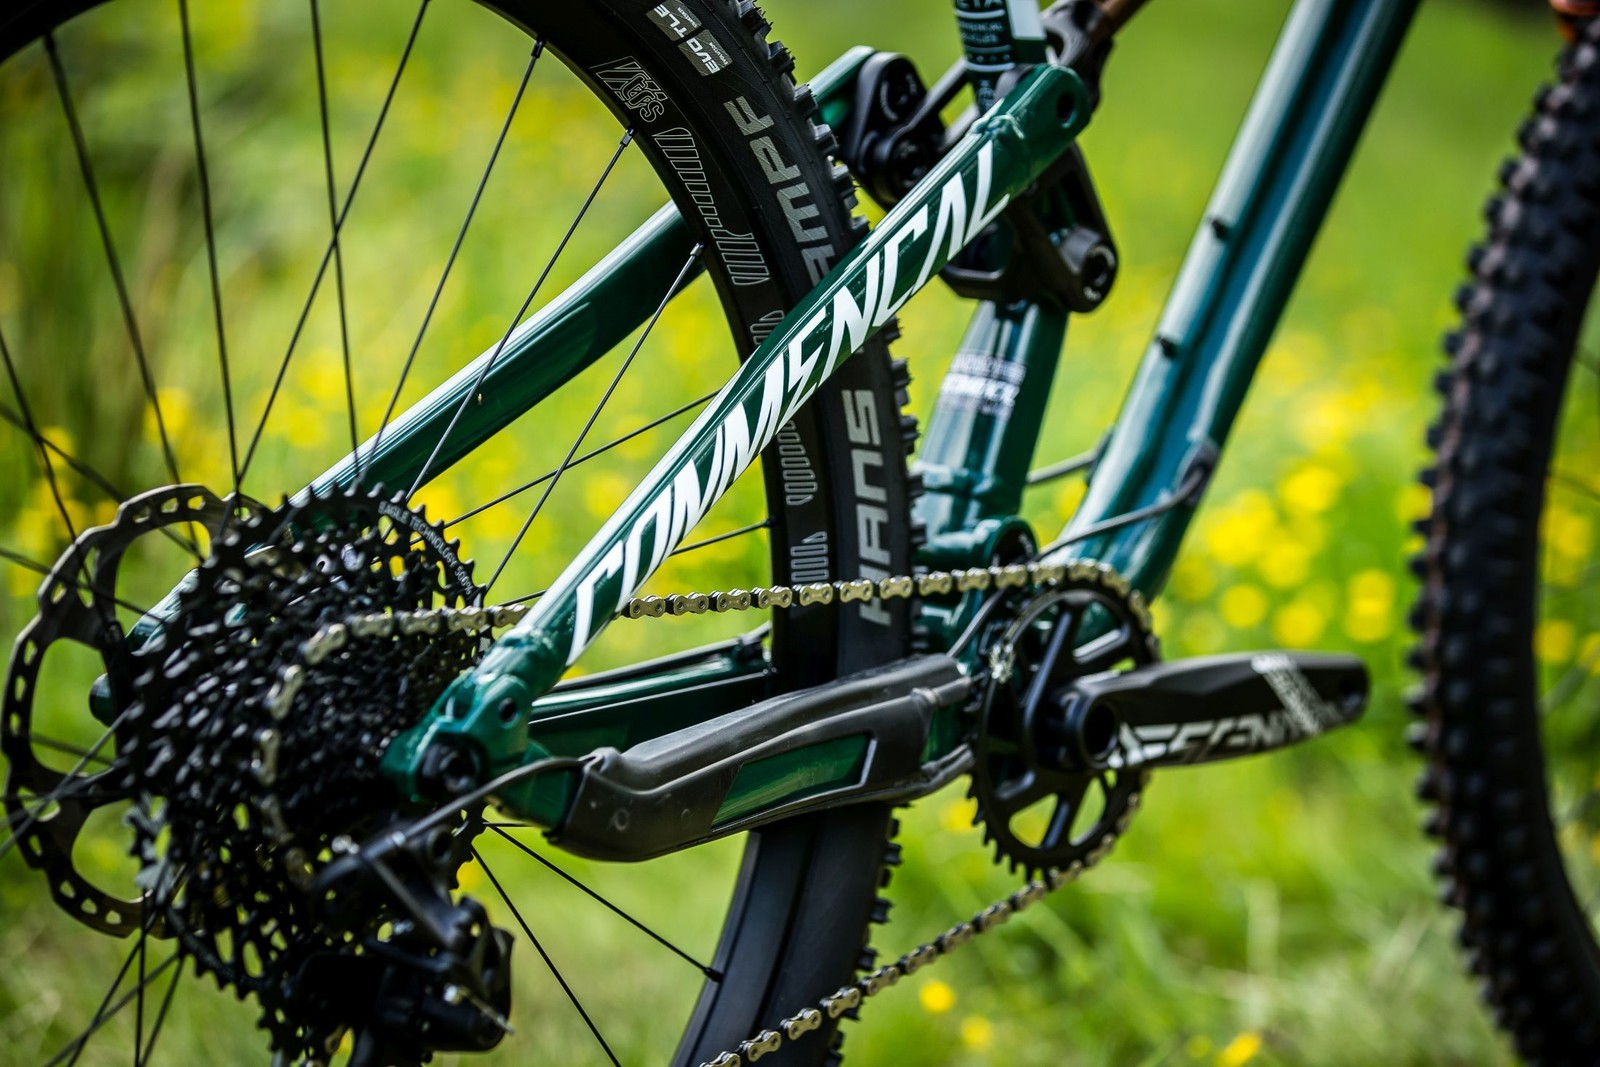 FW18 AN3X7463 - Commencal Meta TR 29 - Mountain Biking Pictures - Vital MTB